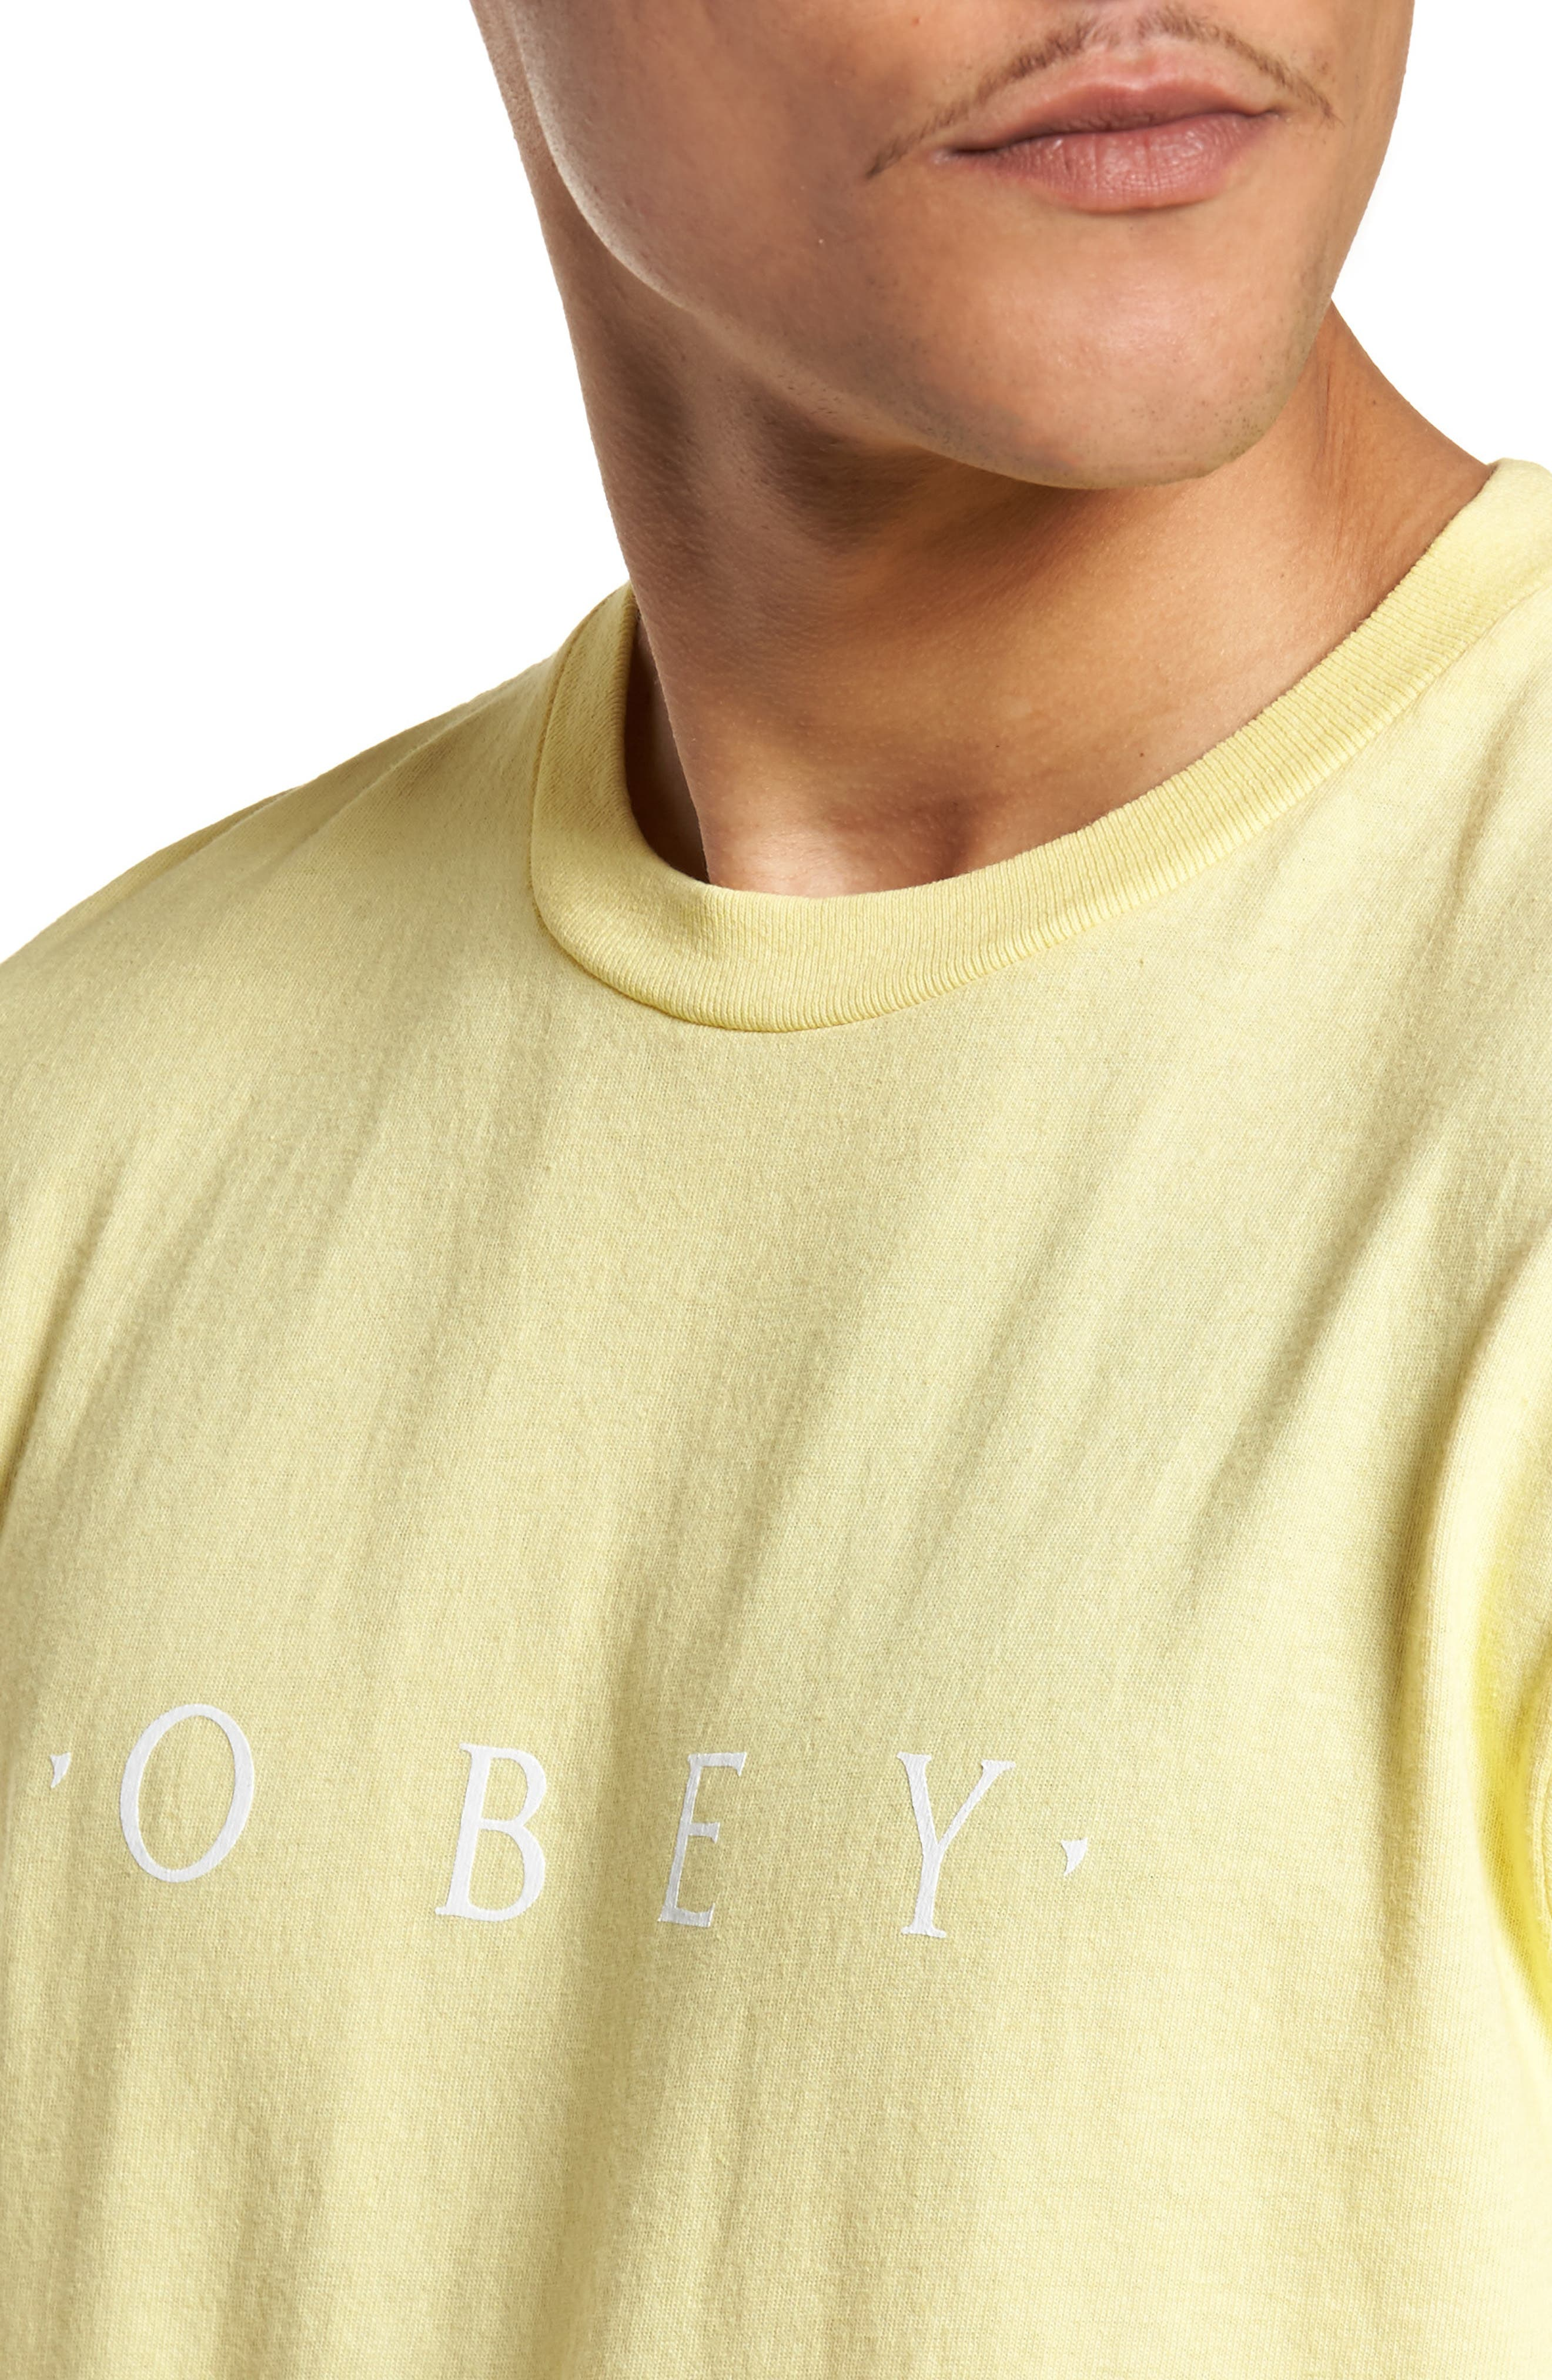 Logo Graphic T-Shirt,                             Alternate thumbnail 3, color,                             Dusty Lemon